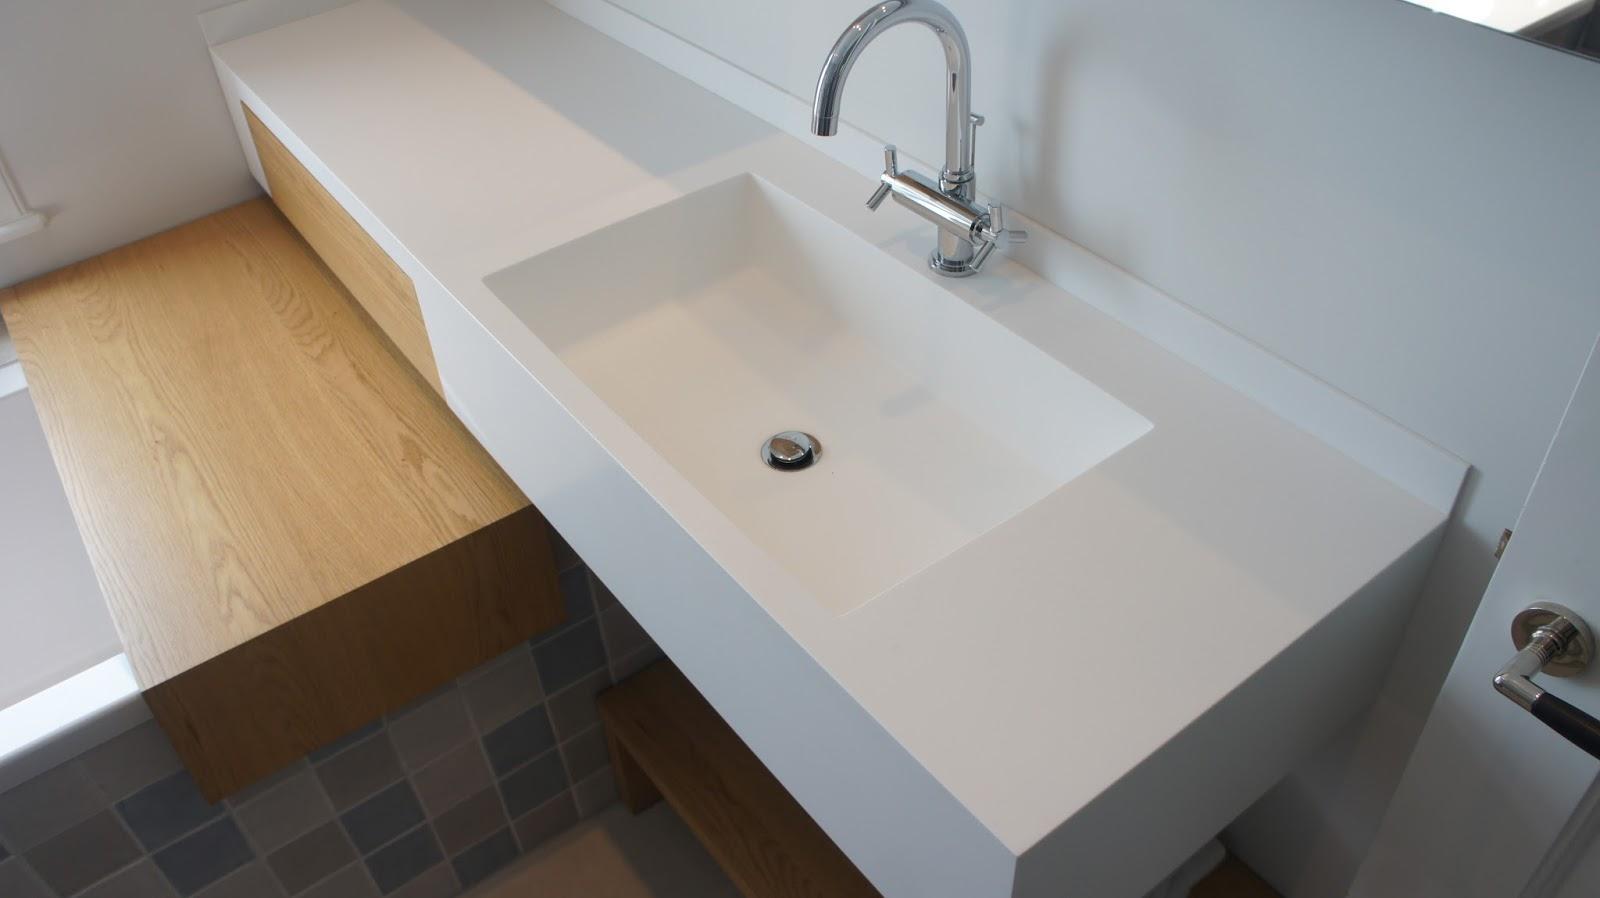 Onderbouw wasbak badkamer wastafels van hi macs solid surface van